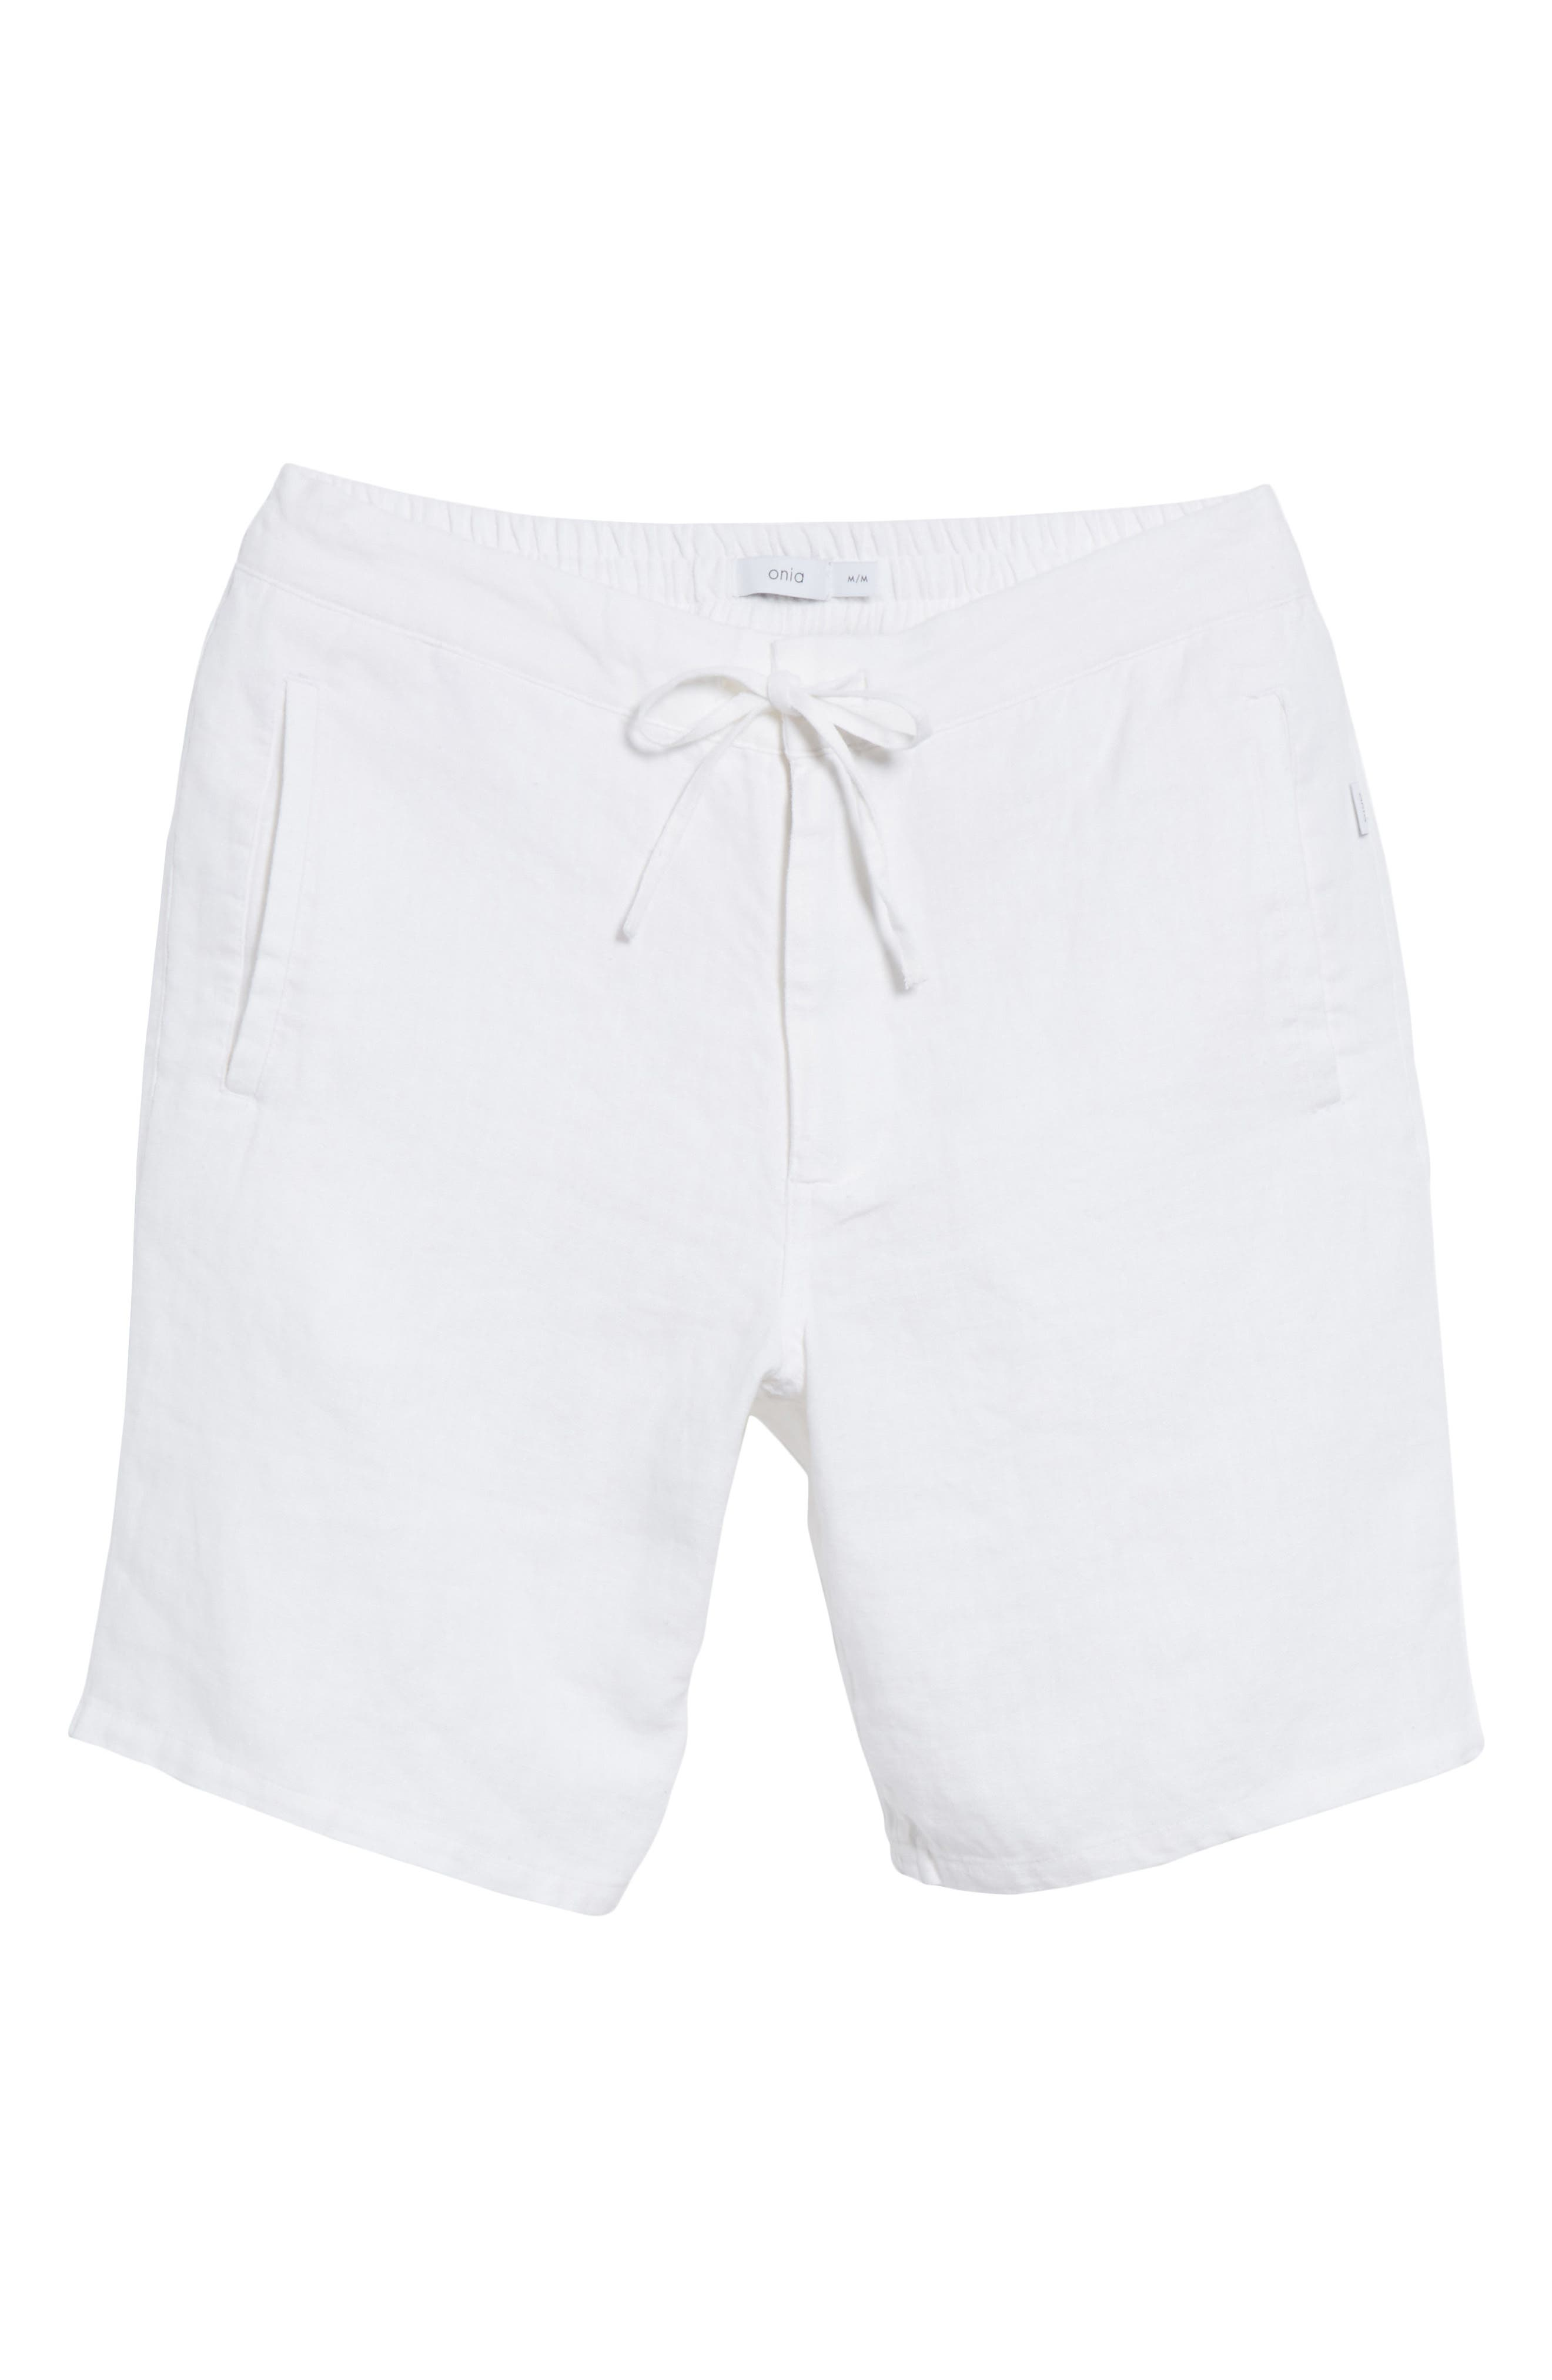 Max Linen Shorts,                             Alternate thumbnail 6, color,                             WHITE